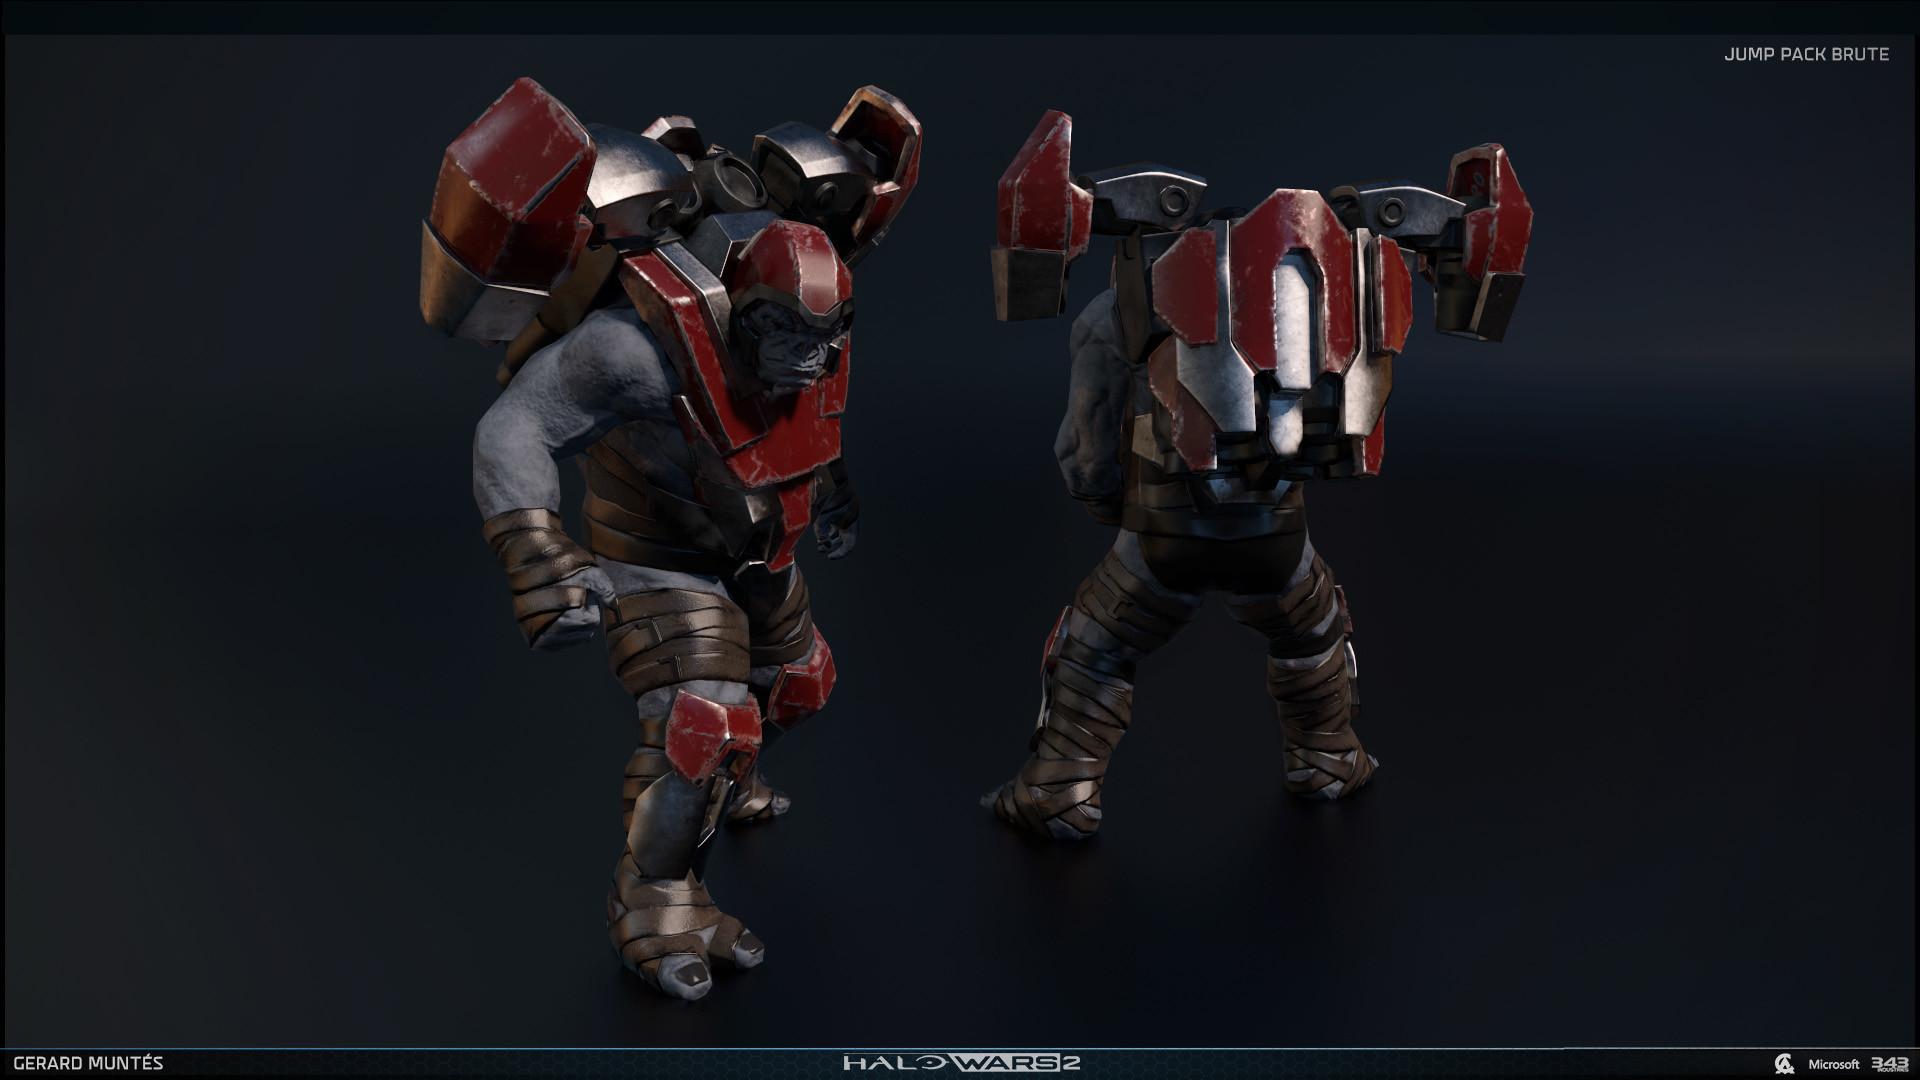 ArtStation - Halo wars 2 Banished, Gerard Muntés